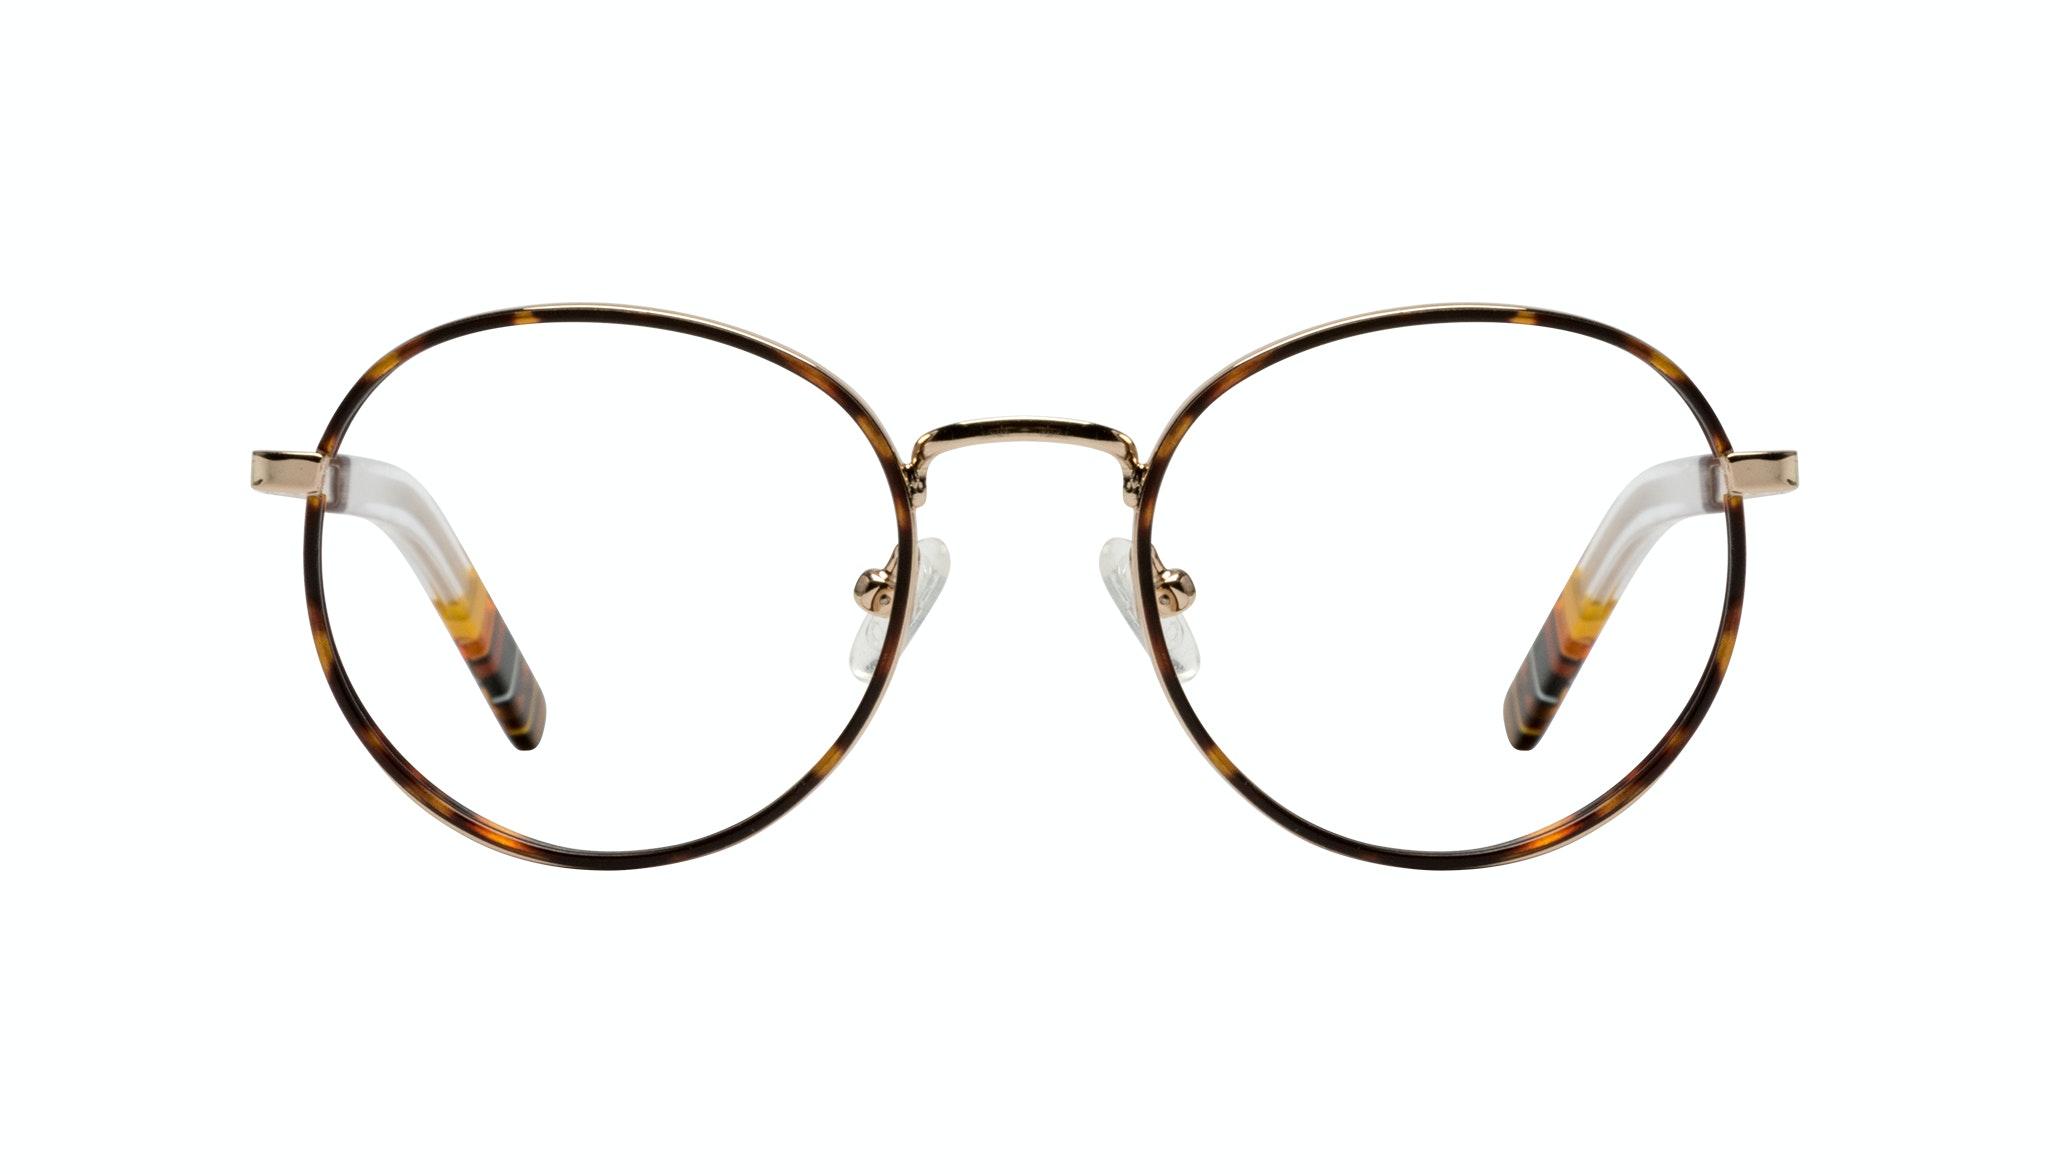 Affordable Fashion Glasses Round Eyeglasses Men Reach Tortoise Front